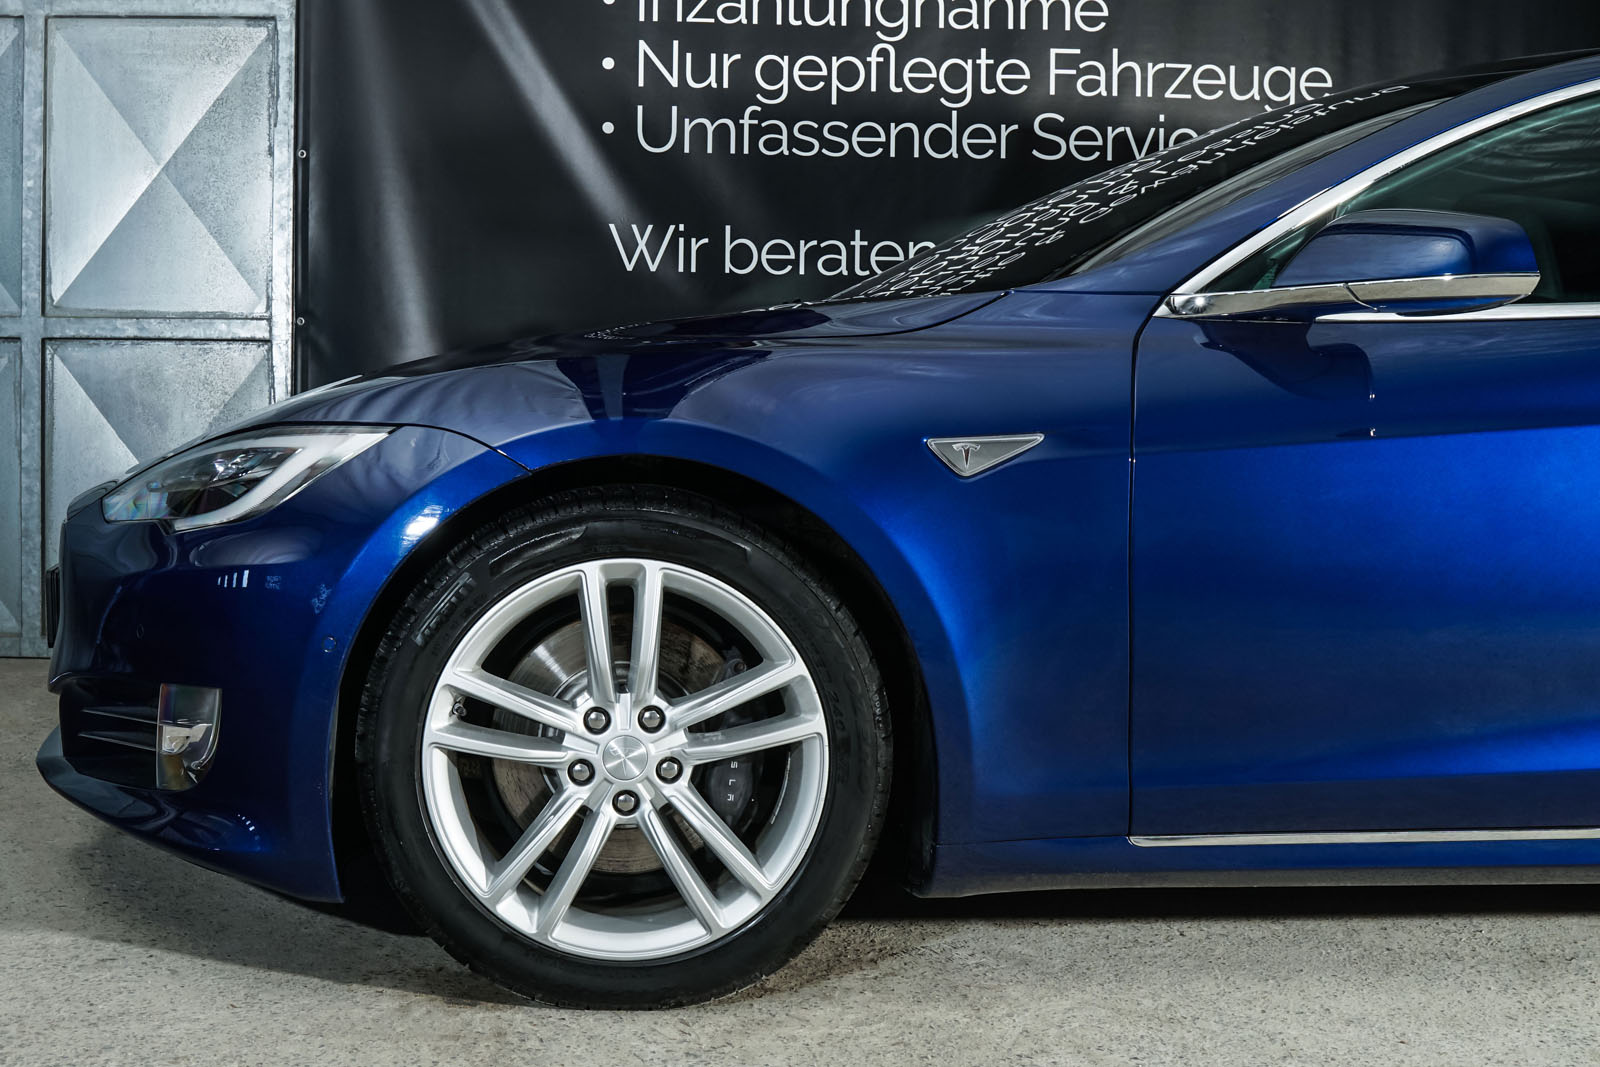 Tesla_ModelS_90D_Blau_Schwarz_Tes-0513_3_w